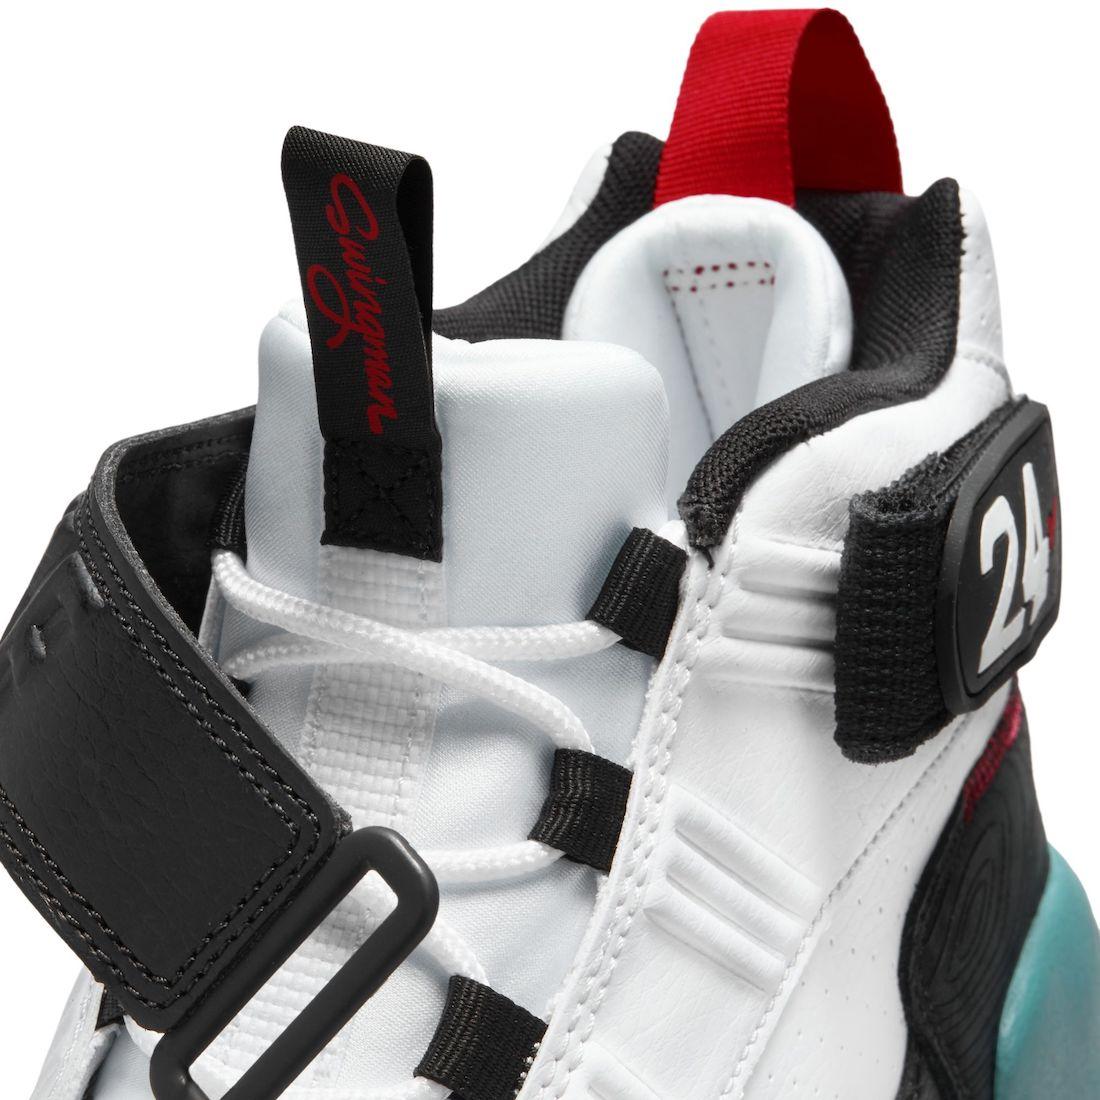 Nike Air Griffey Max 1 Swingman Release Date Info